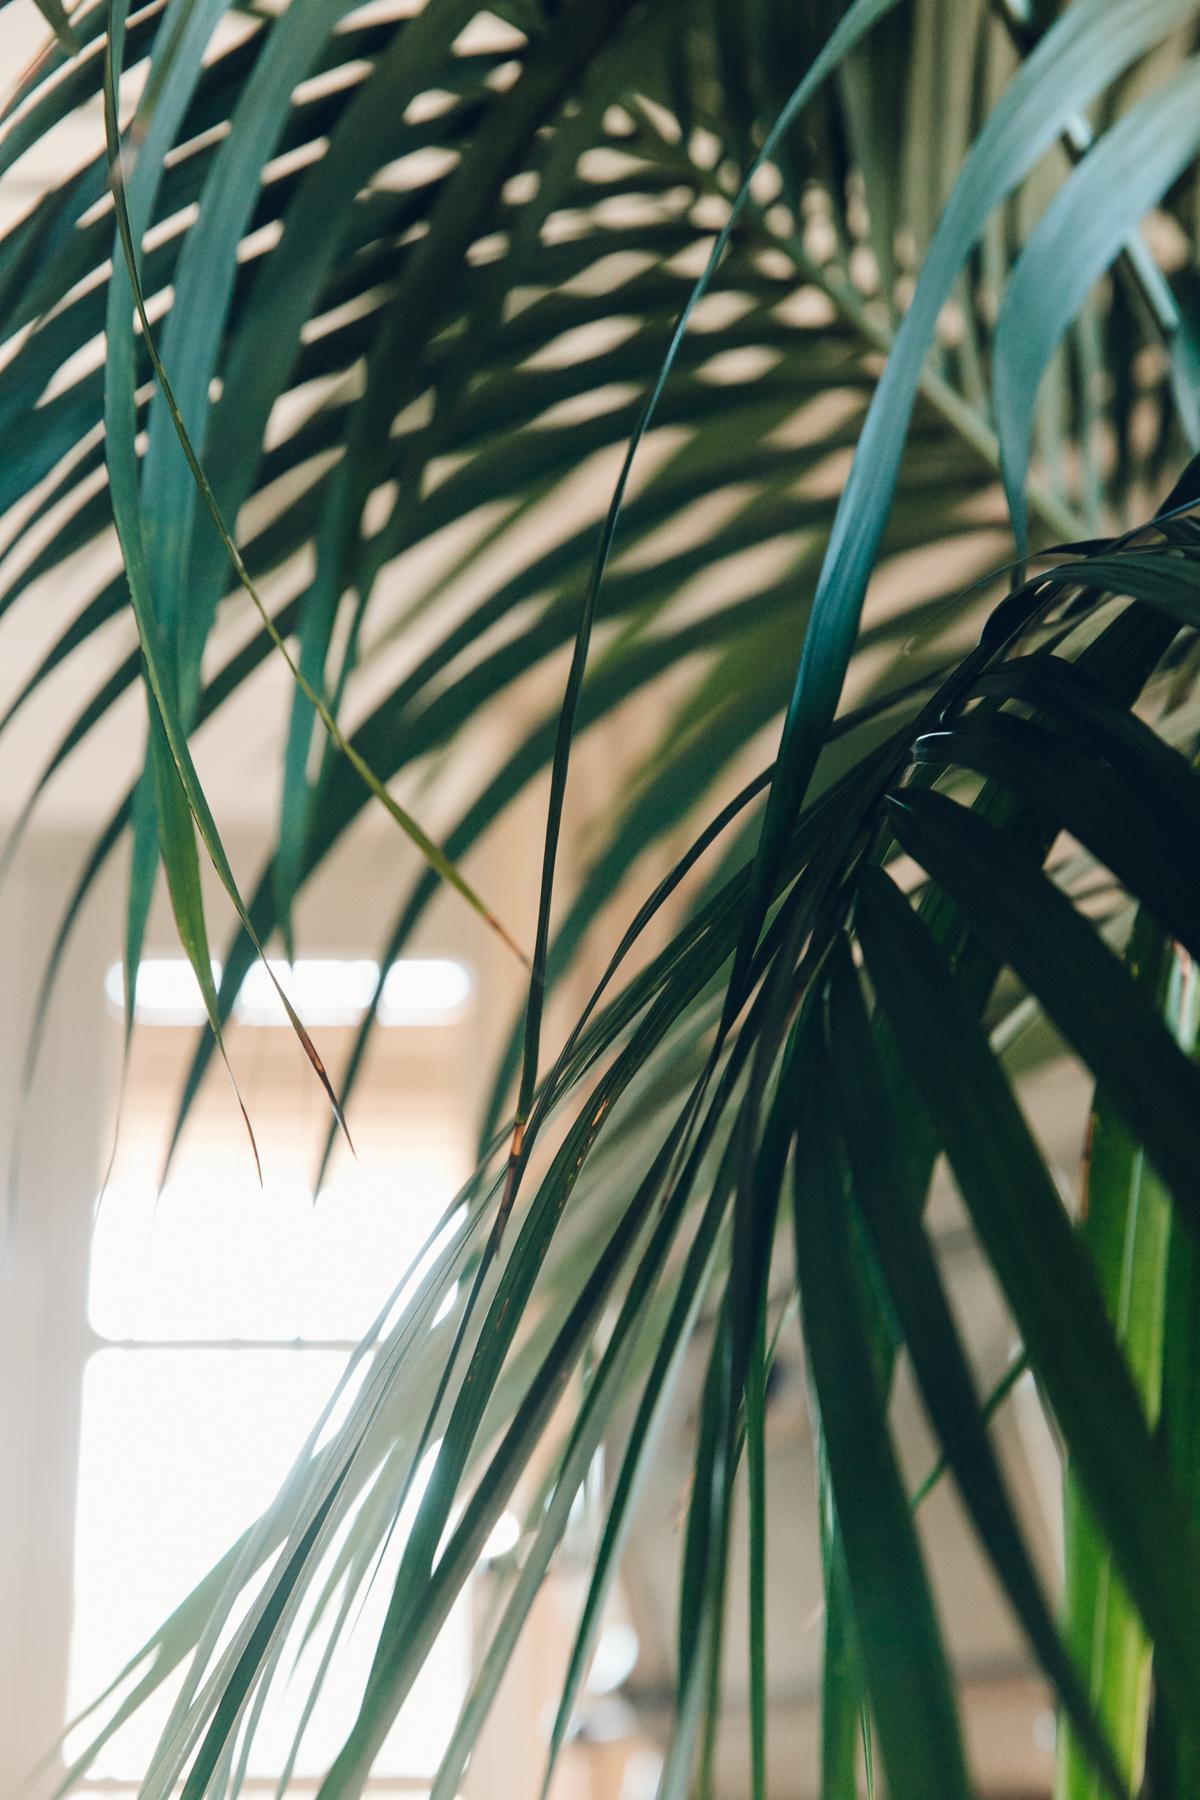 Palm tree details.